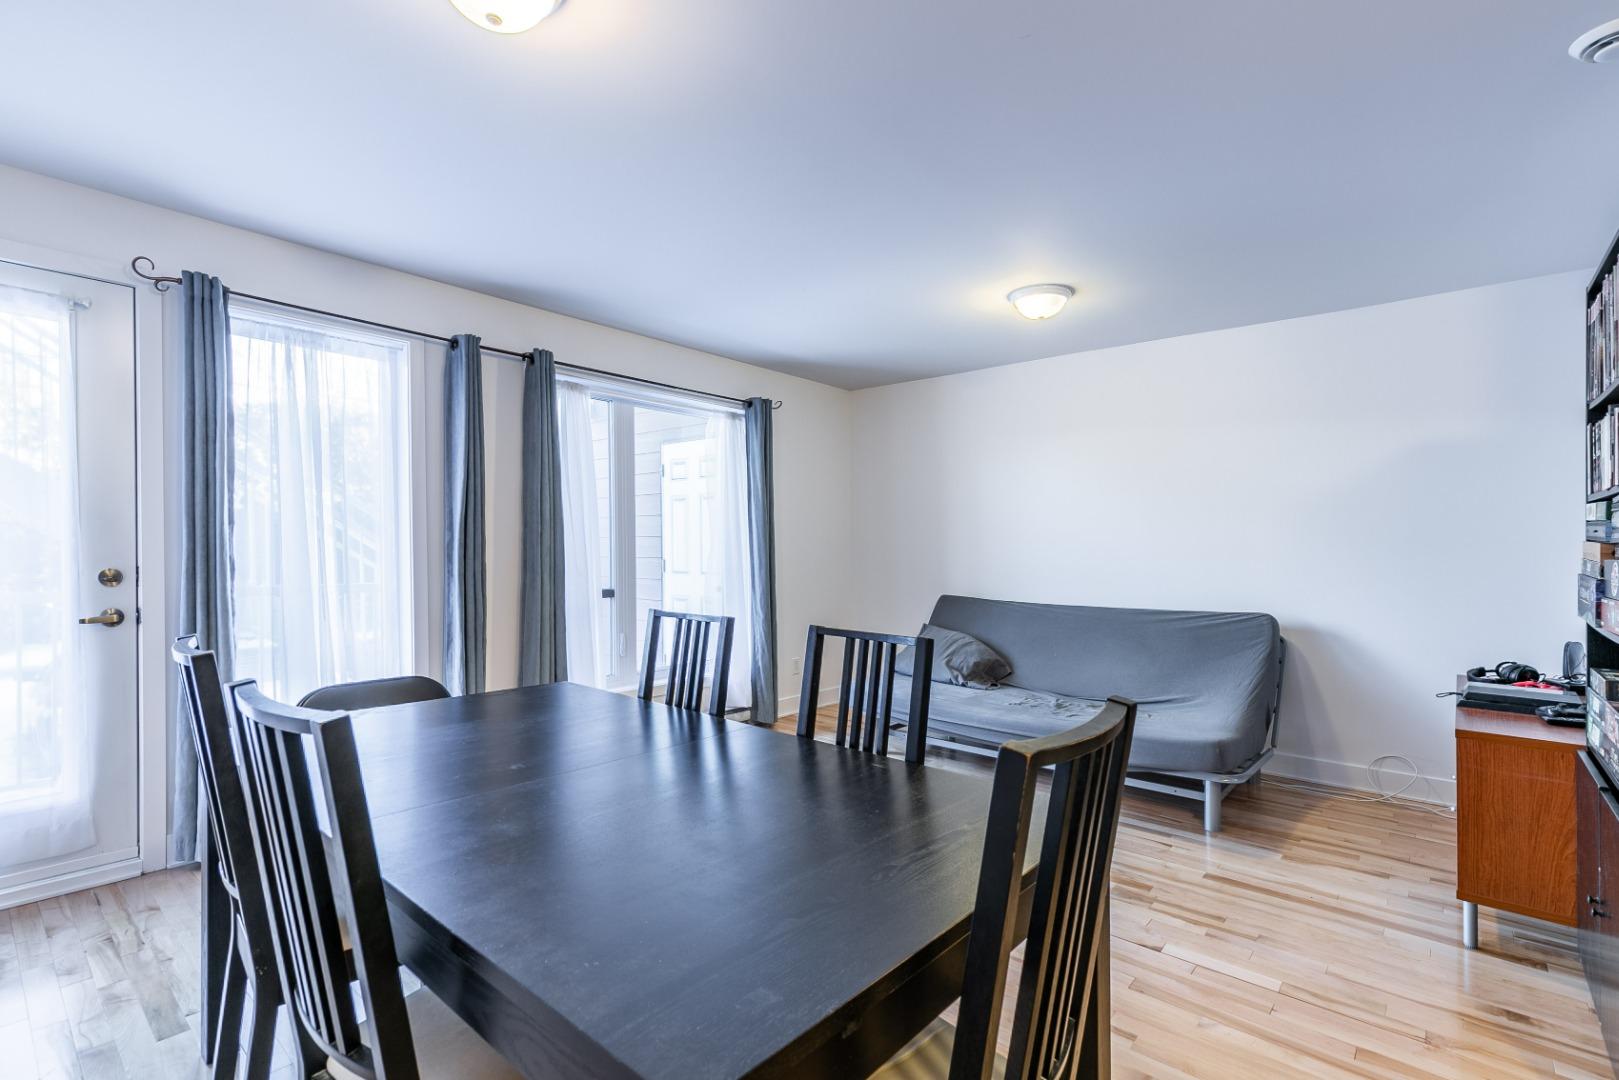 Condo à vendre Ahuntsic - 9985 Rue Lajeunesse #203